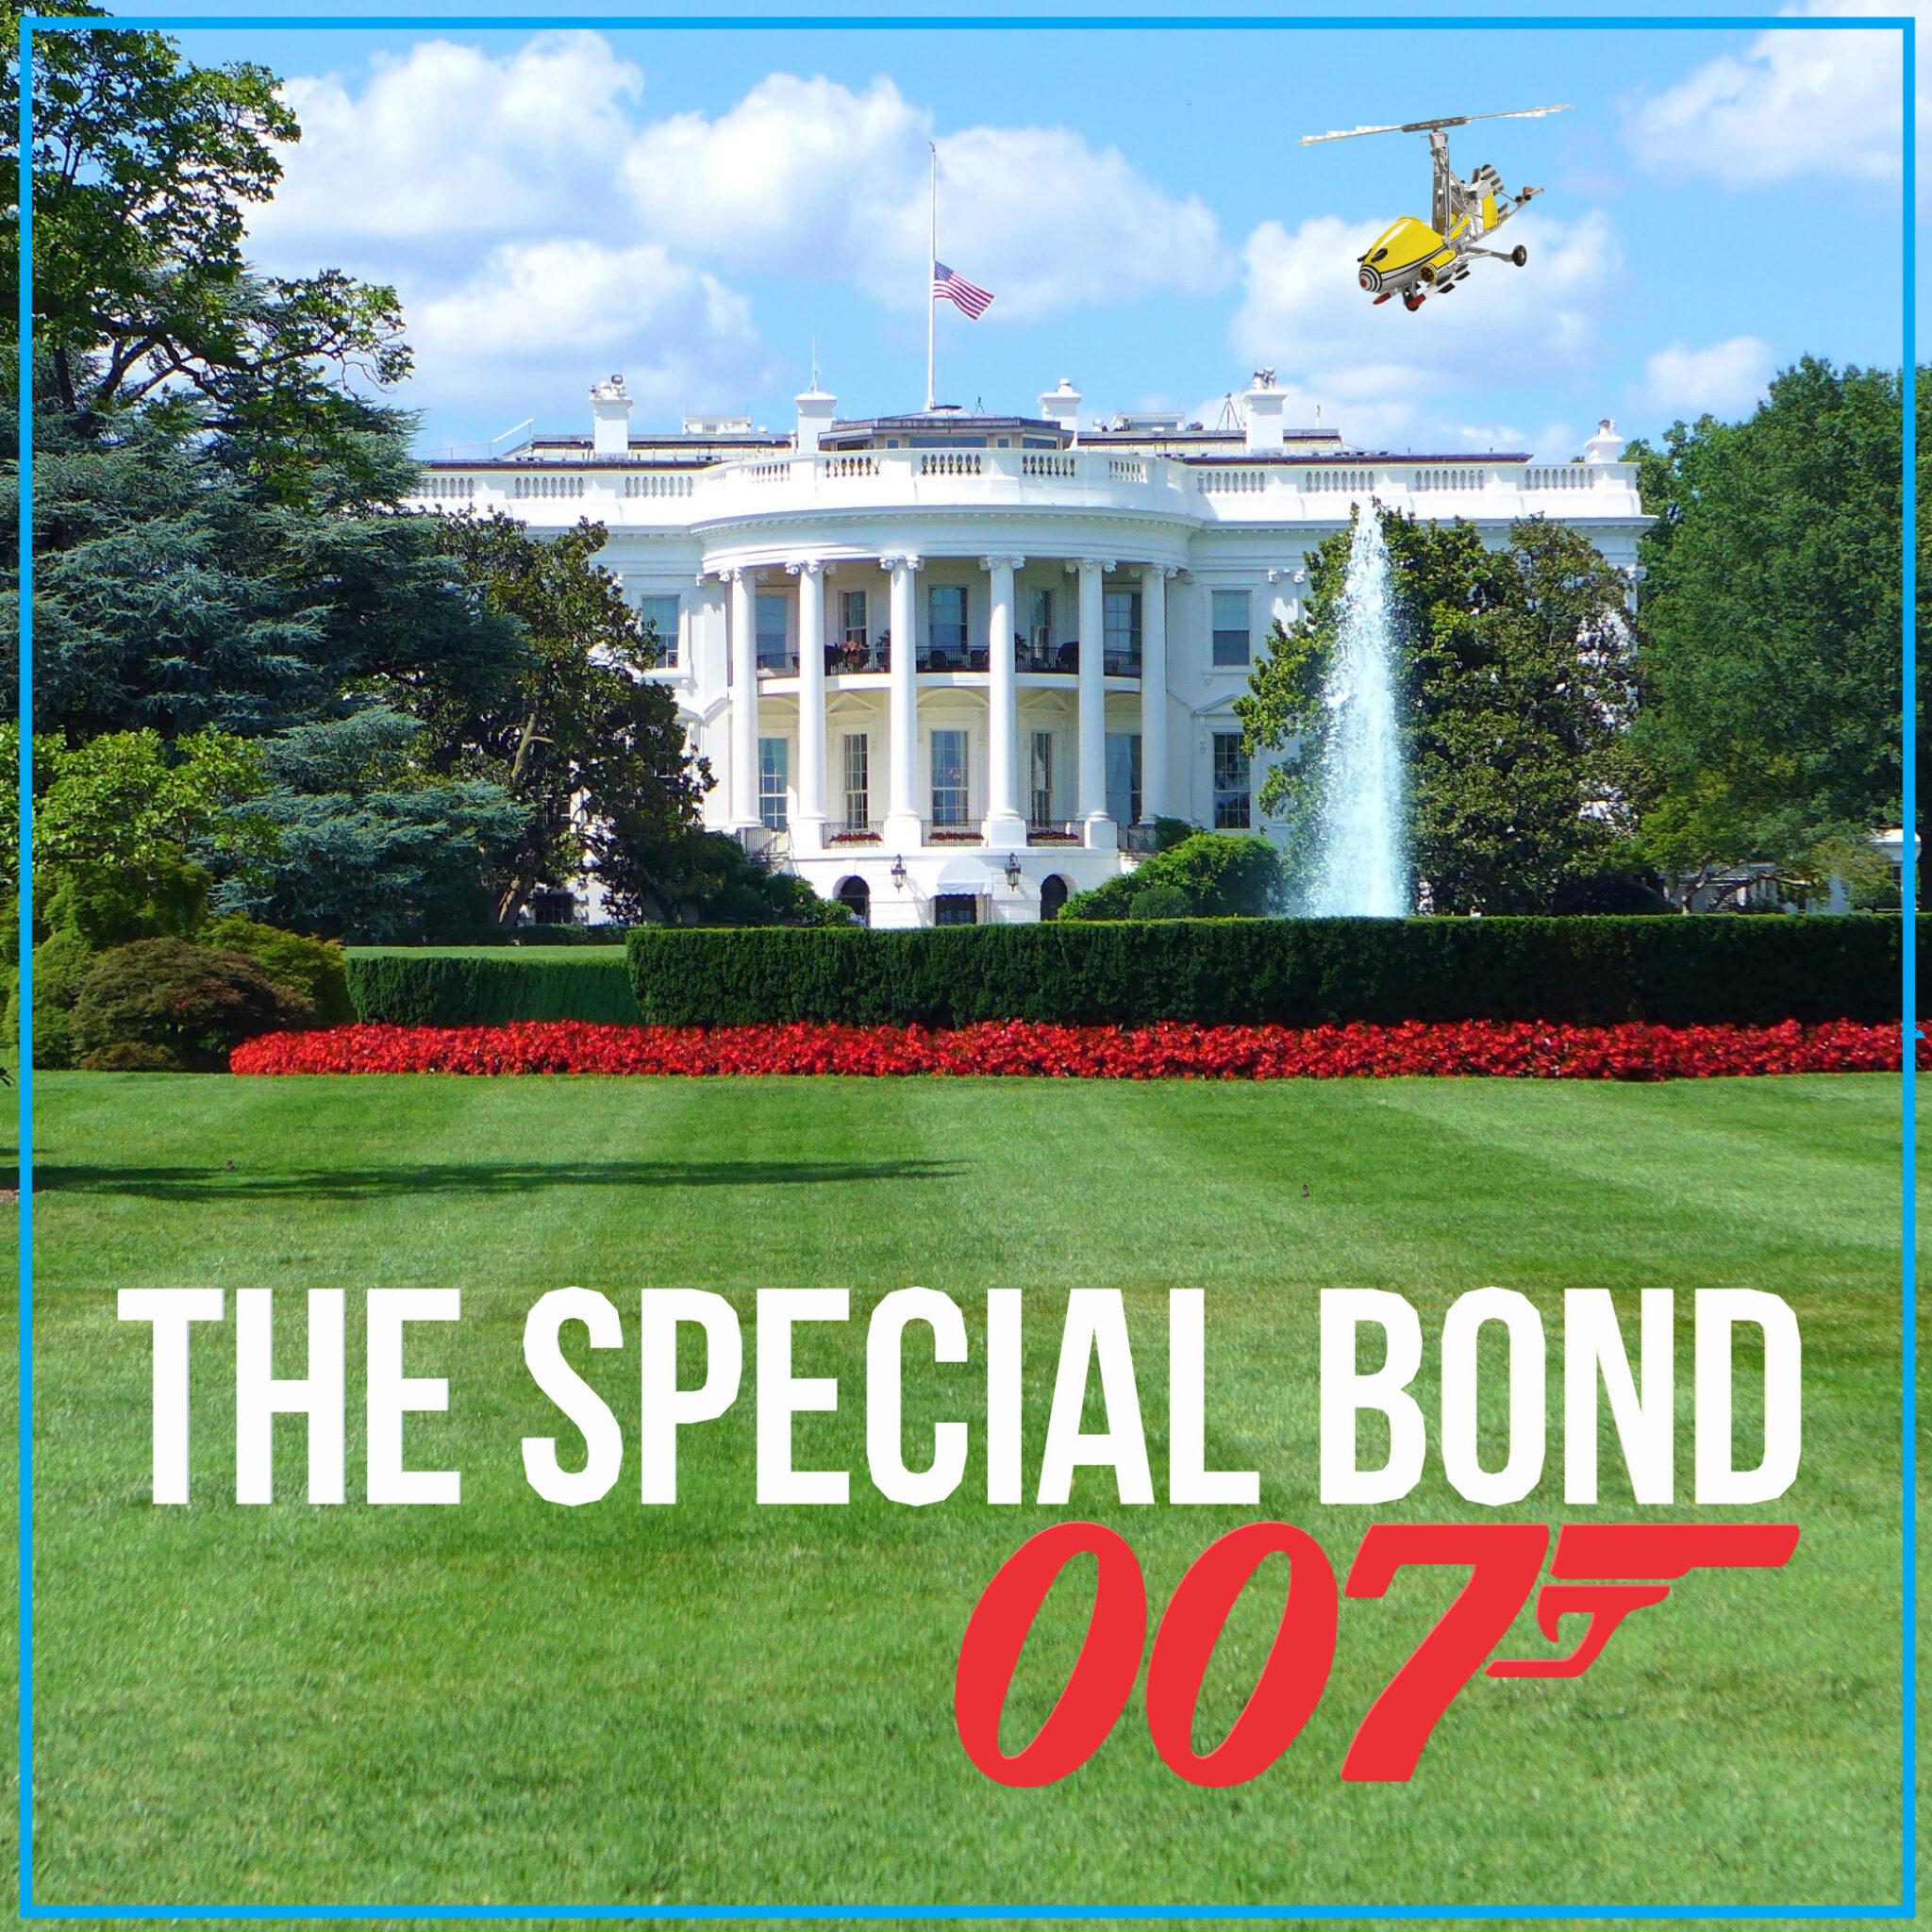 THE-SPECIAL-BOND-2048x2048.jpg